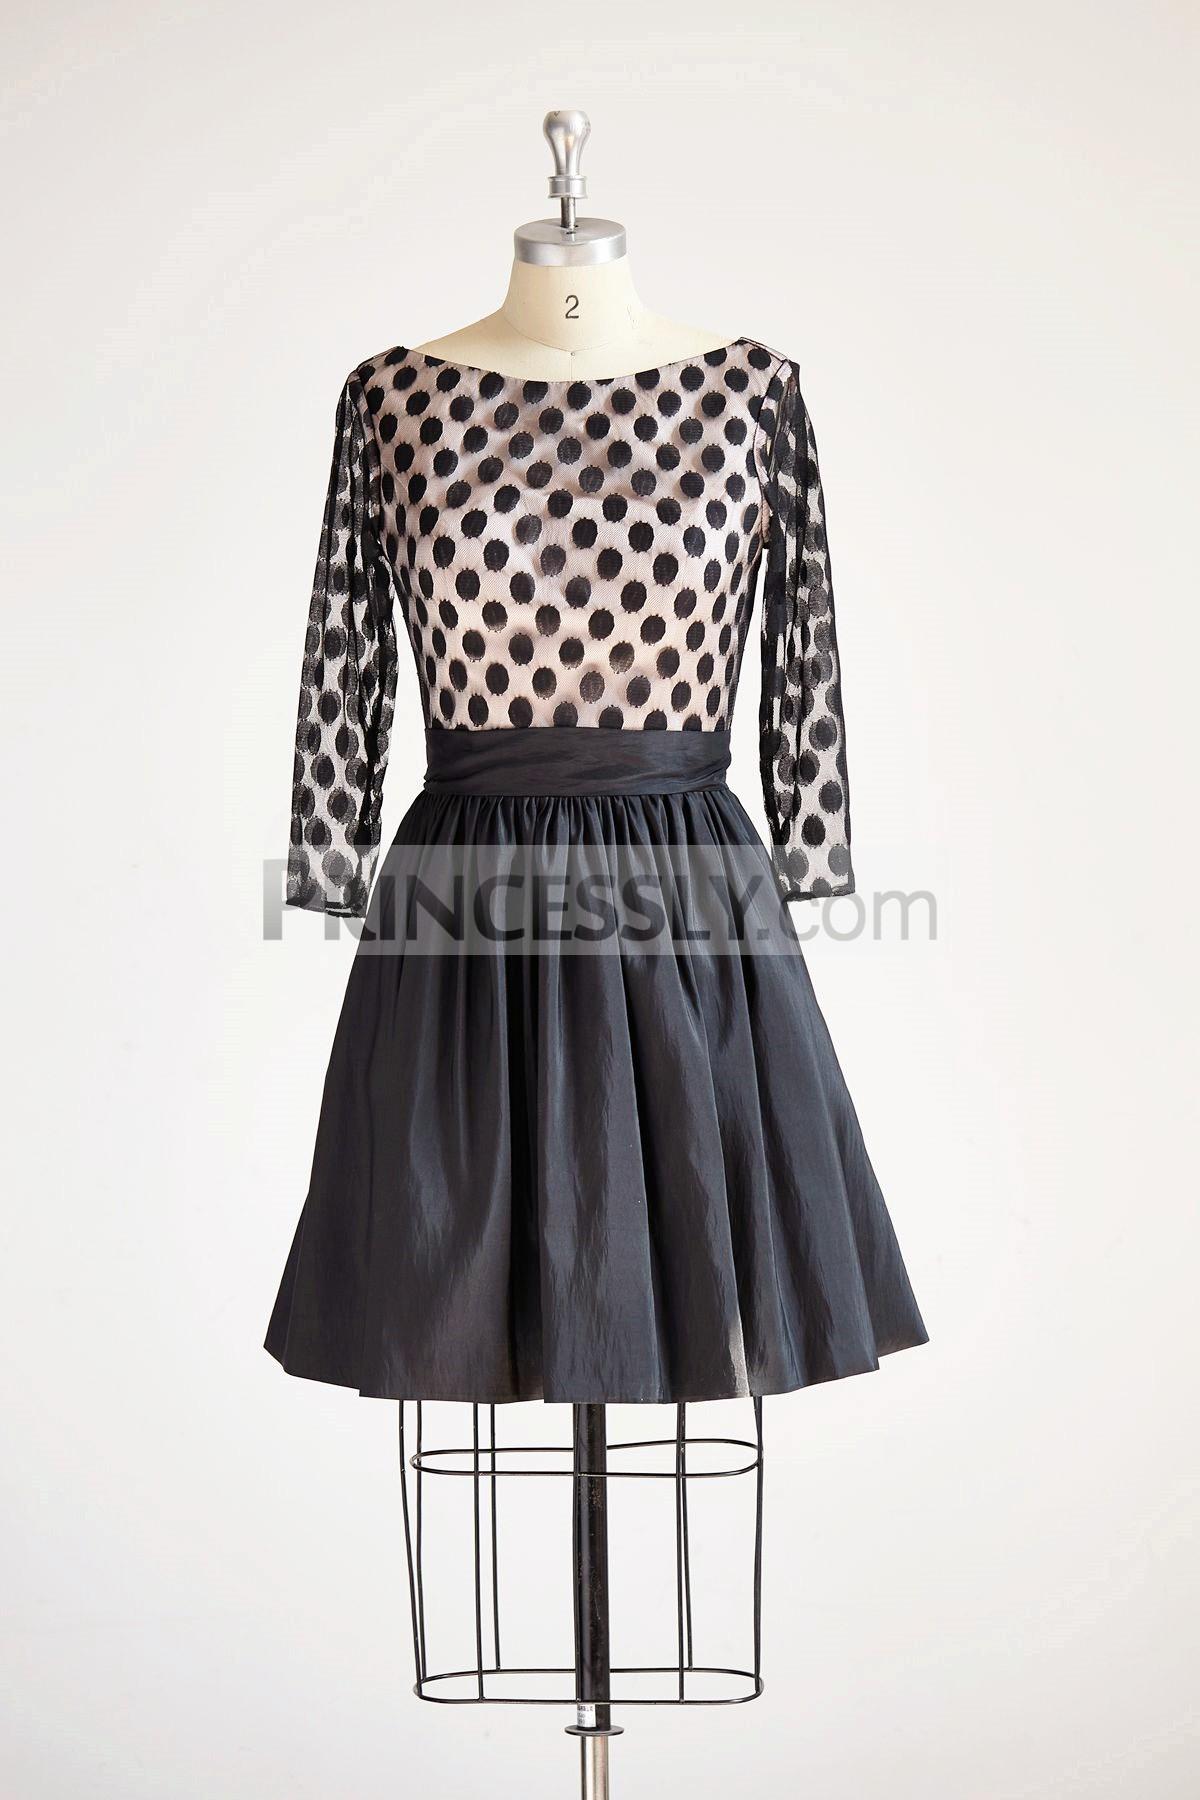 Princessly.com-K1000313-Long Sleeves V Neck Polka Dots Tulle Black Taffeta Short Wedding Bridesmaid Party Dress-31